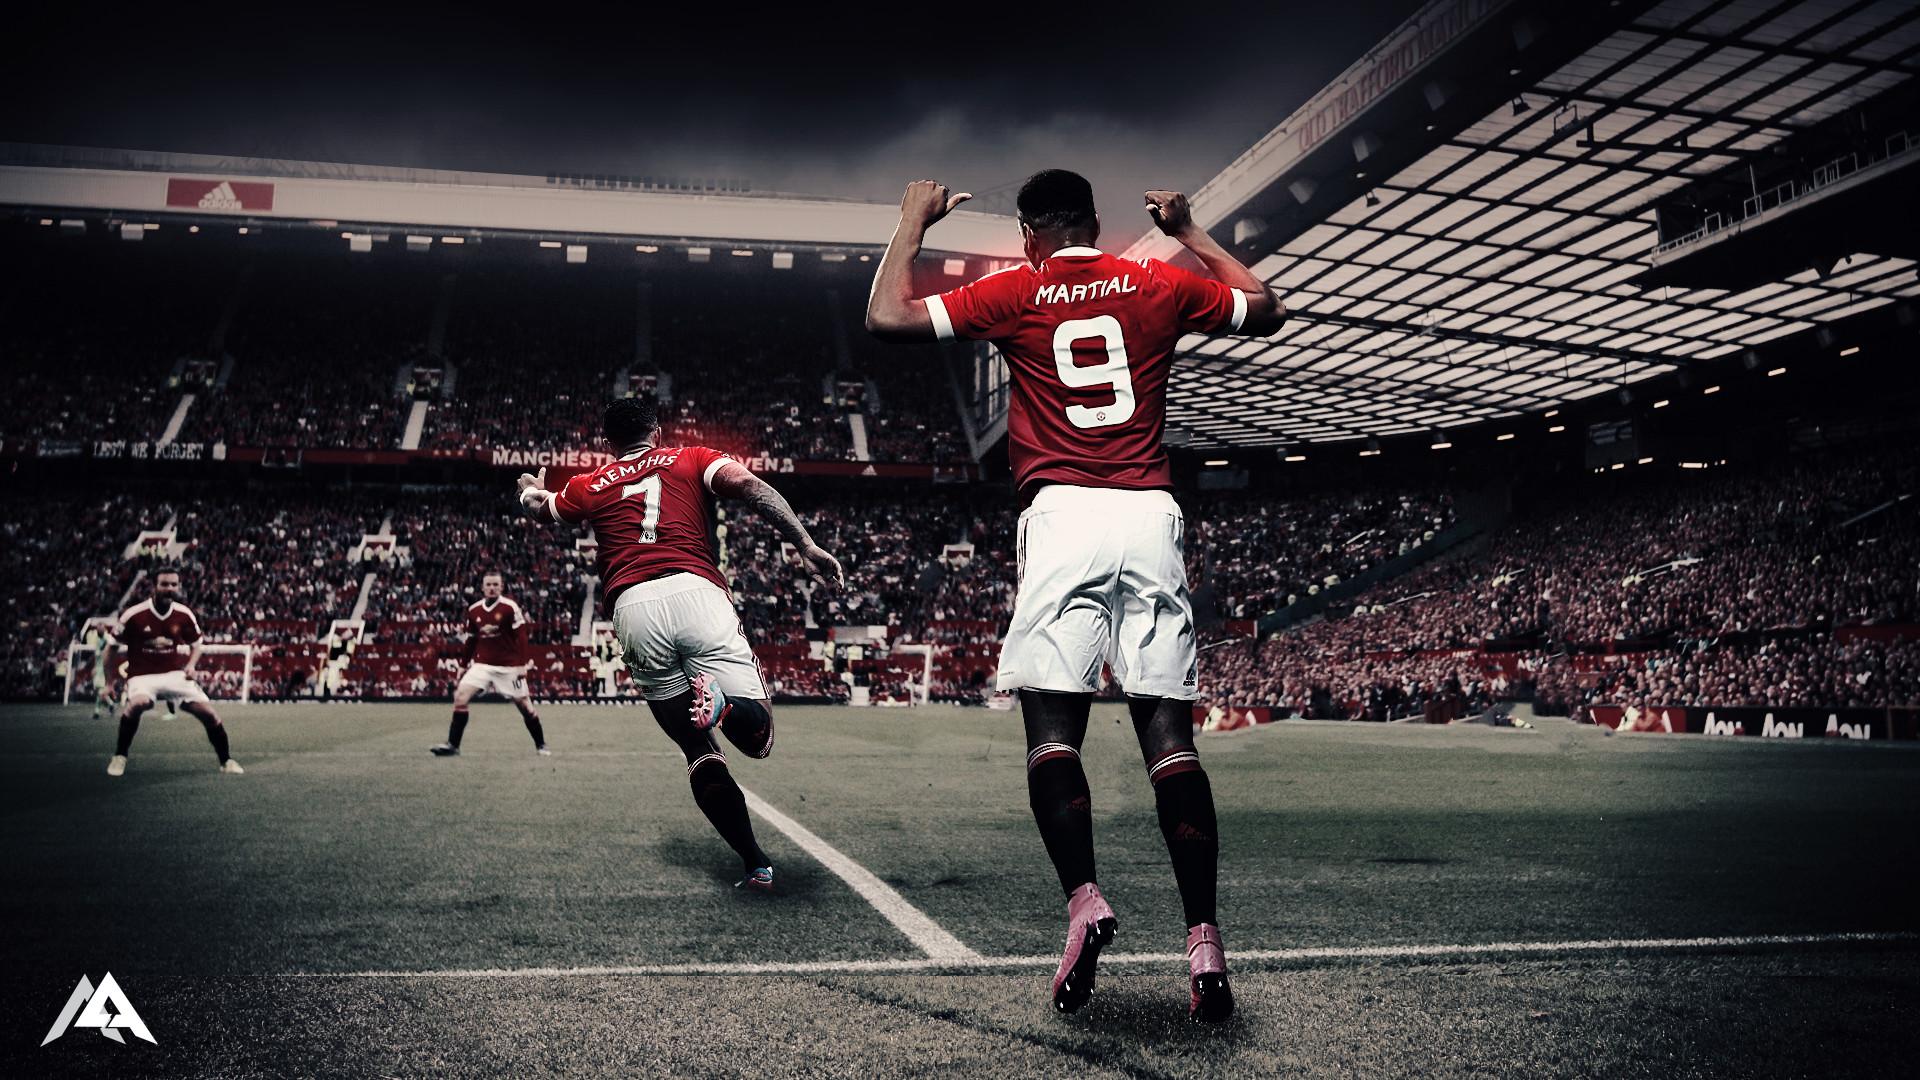 <b>Manchester United</b> vs Southampton Ticket & Travel Guide